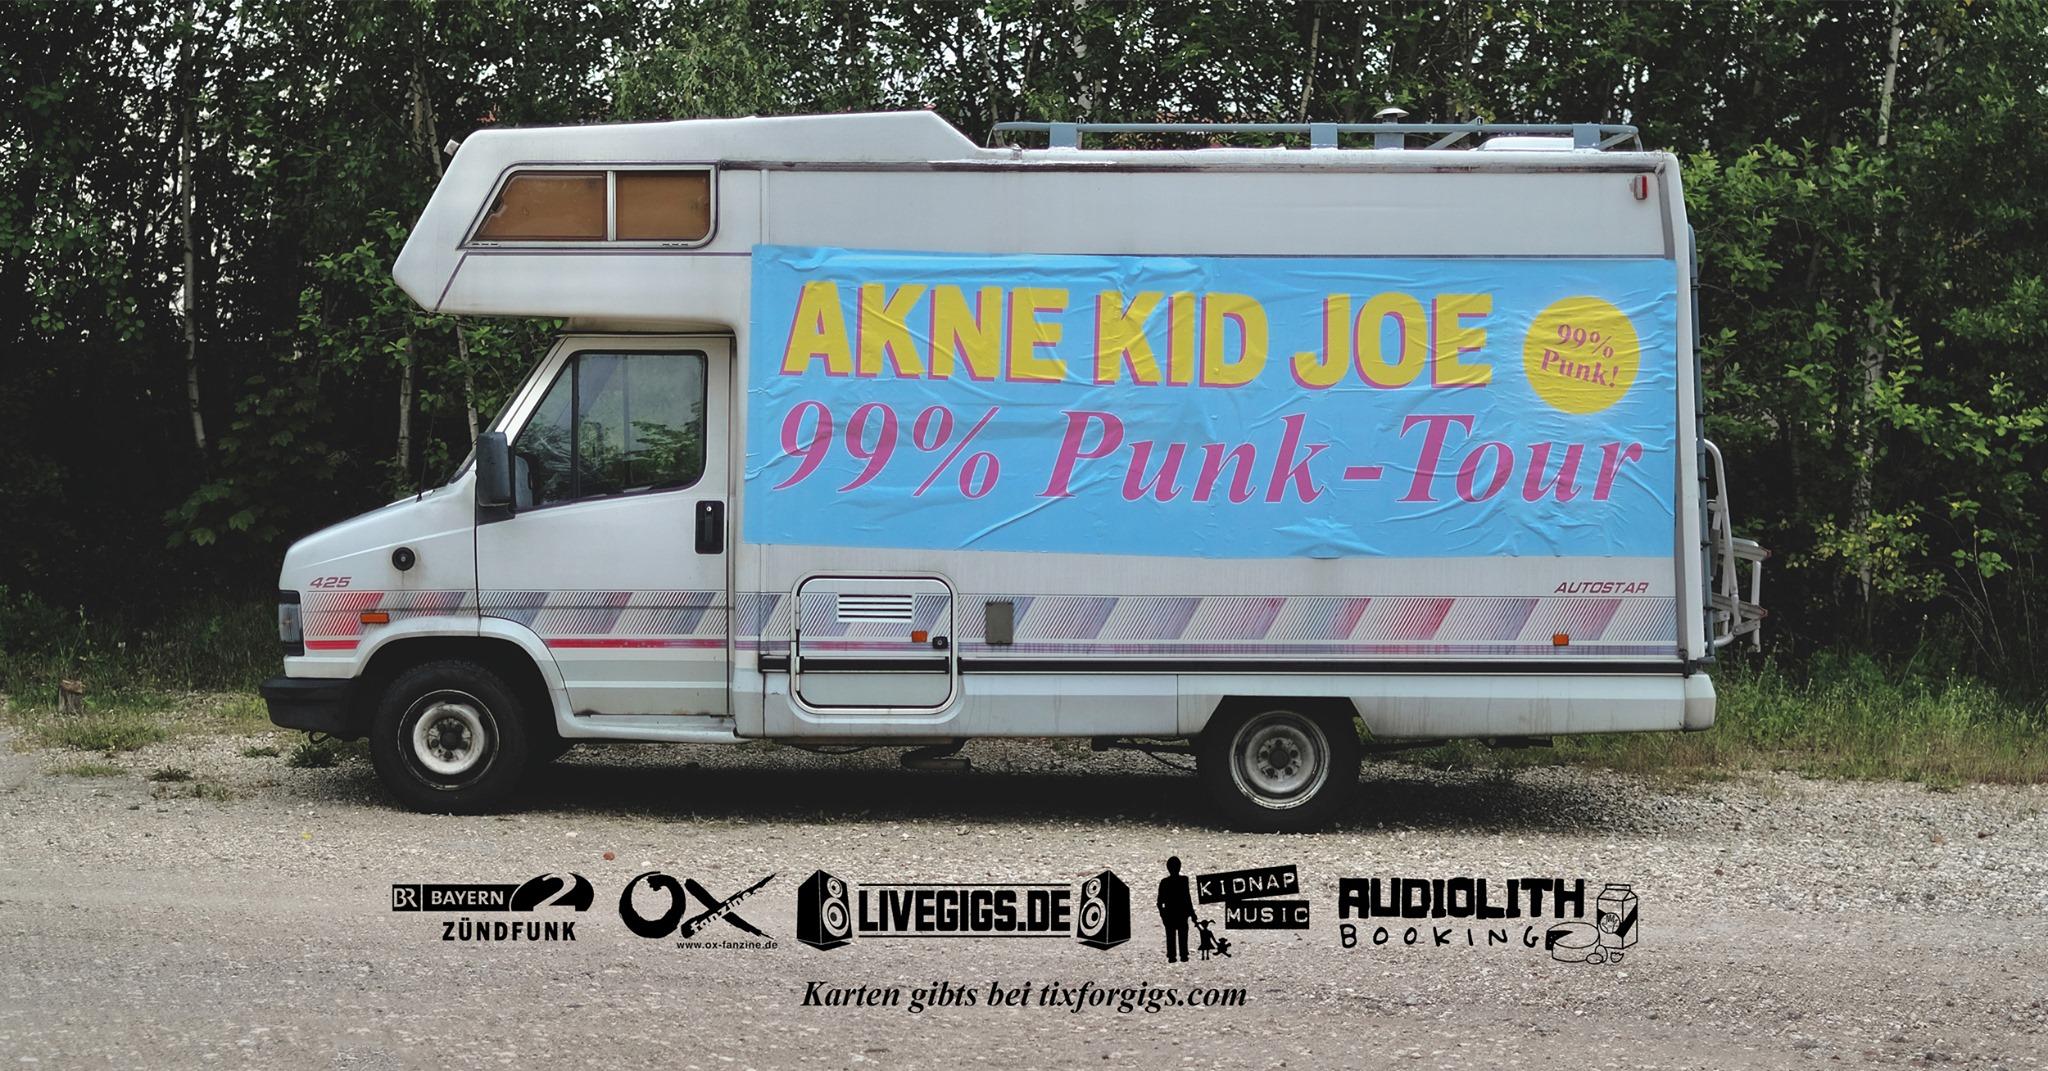 Akne Kid Joe / 99% Punk Tour / Jena / Kassablanca